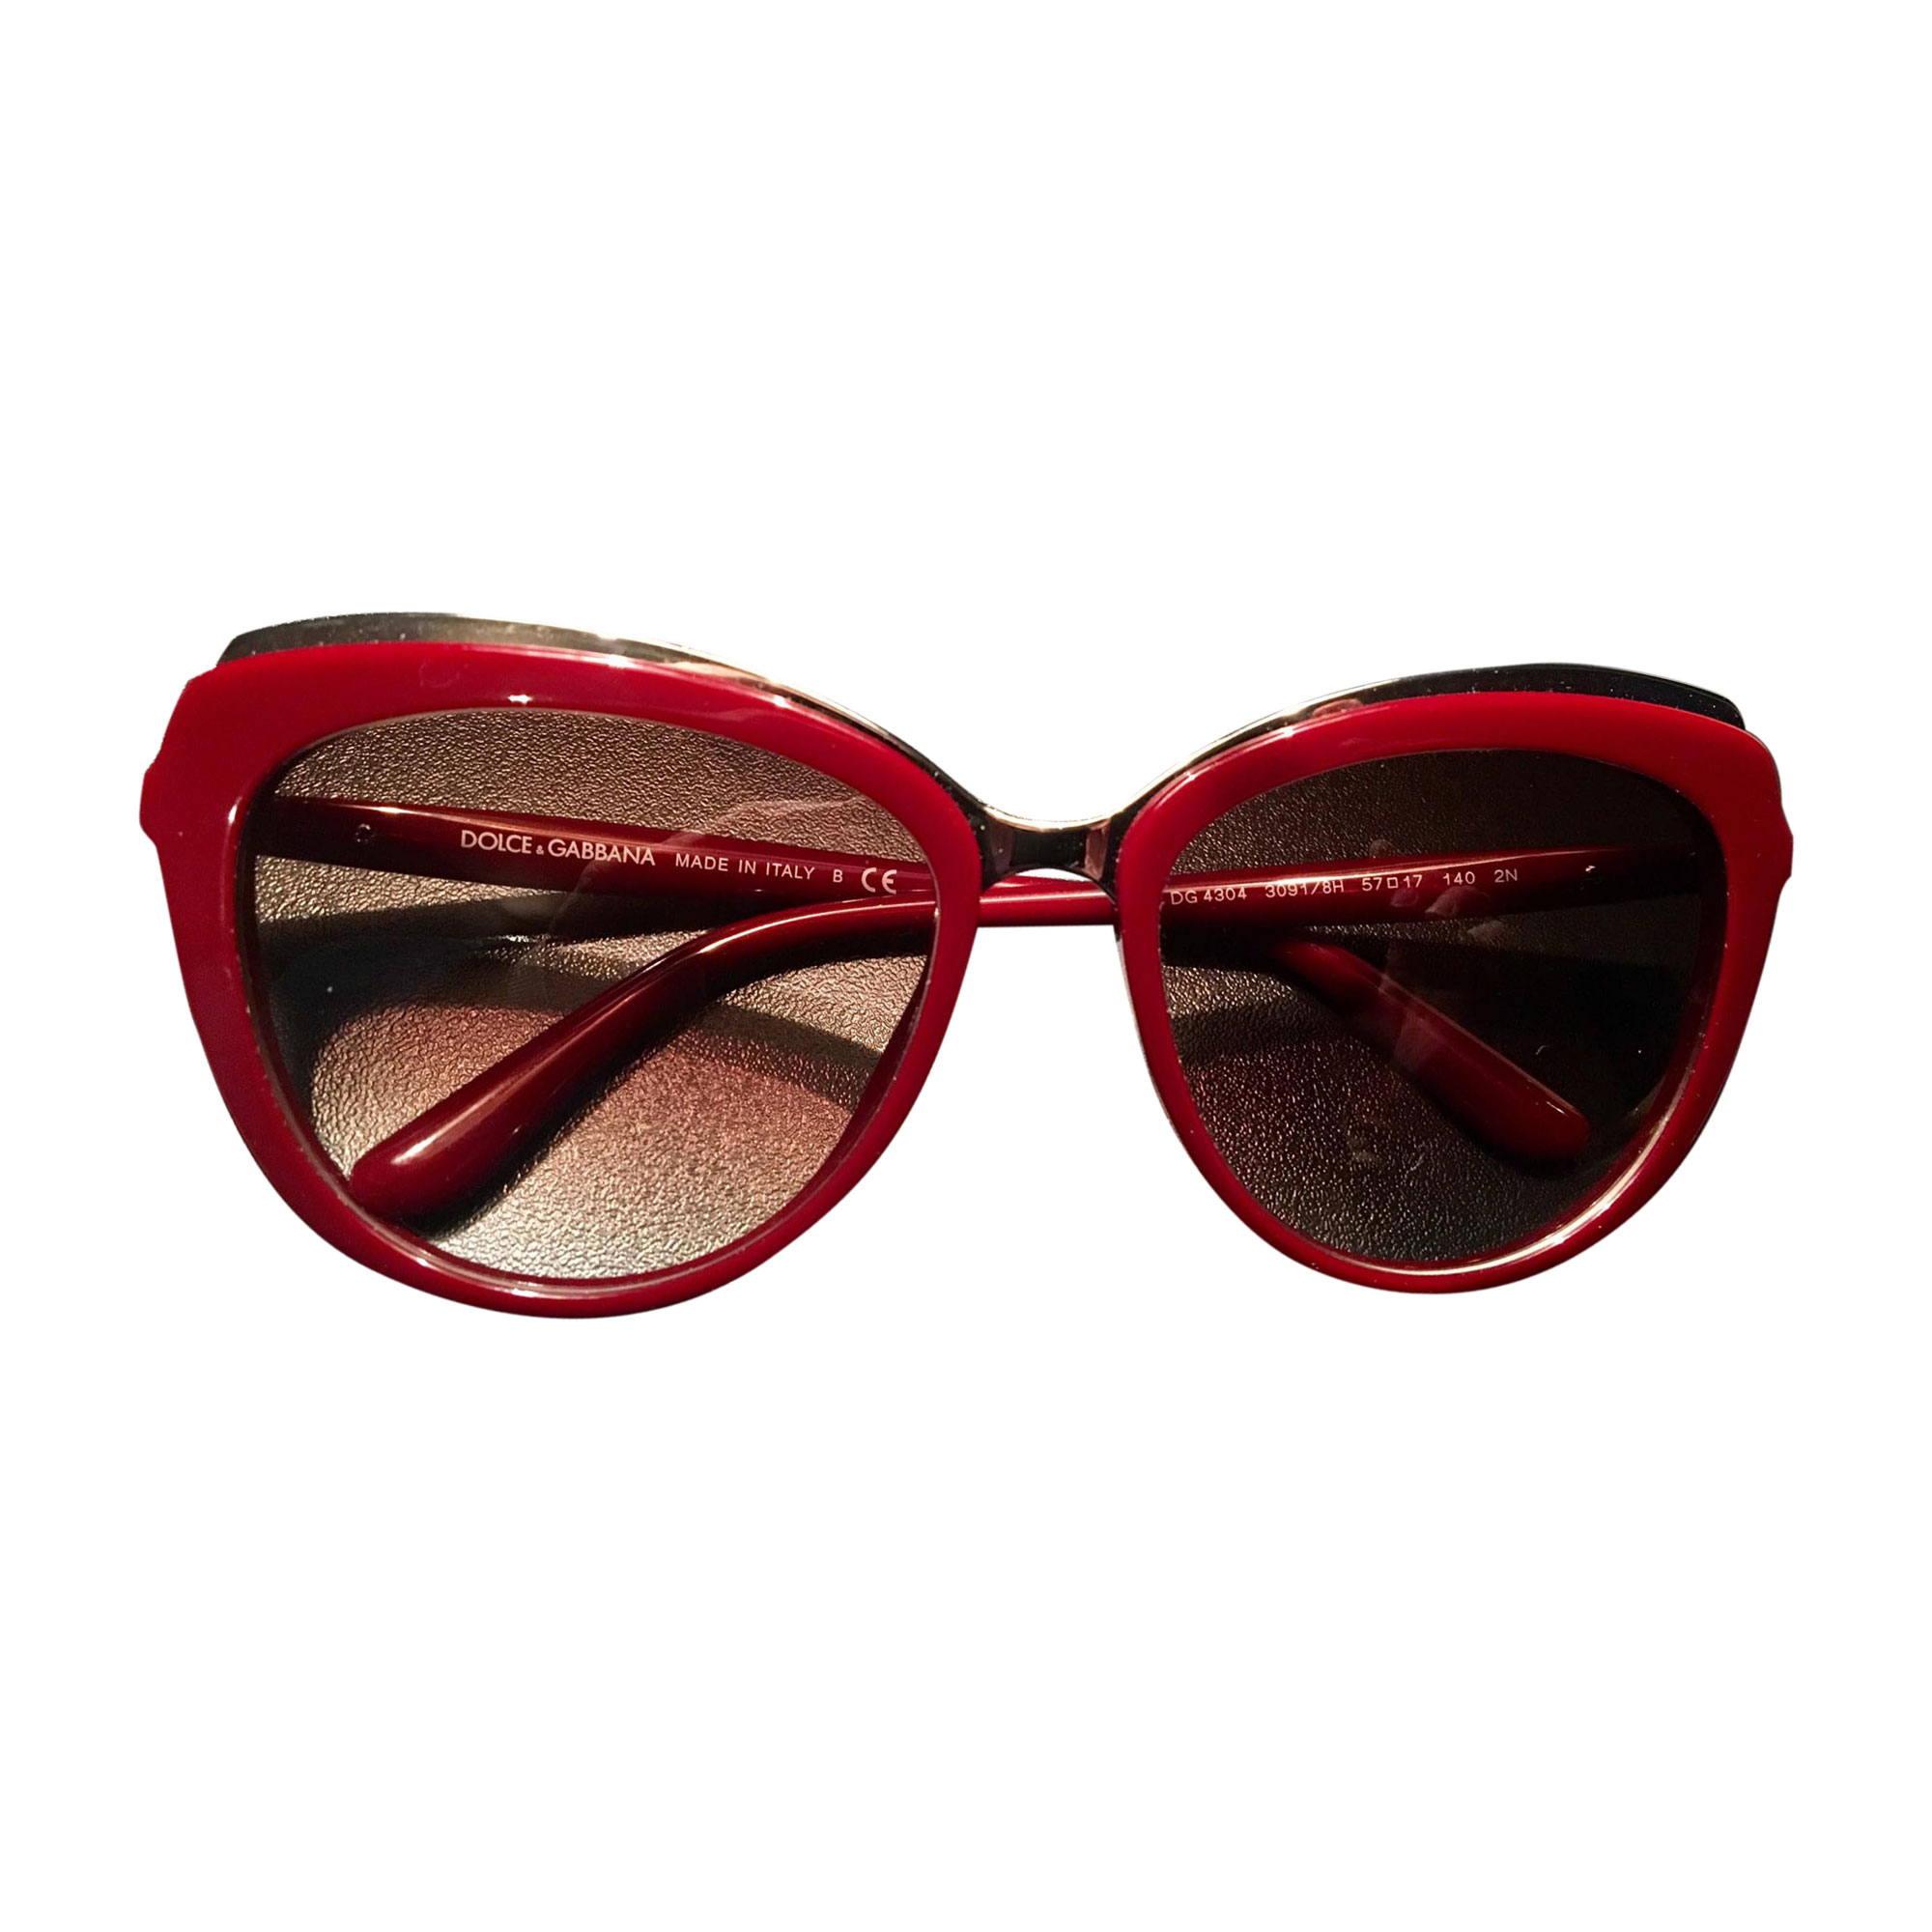 De Rouge Rwxqawoa0 Amp; 7507779 Dolce Lunettes Gabbana Soleil rxoedCB